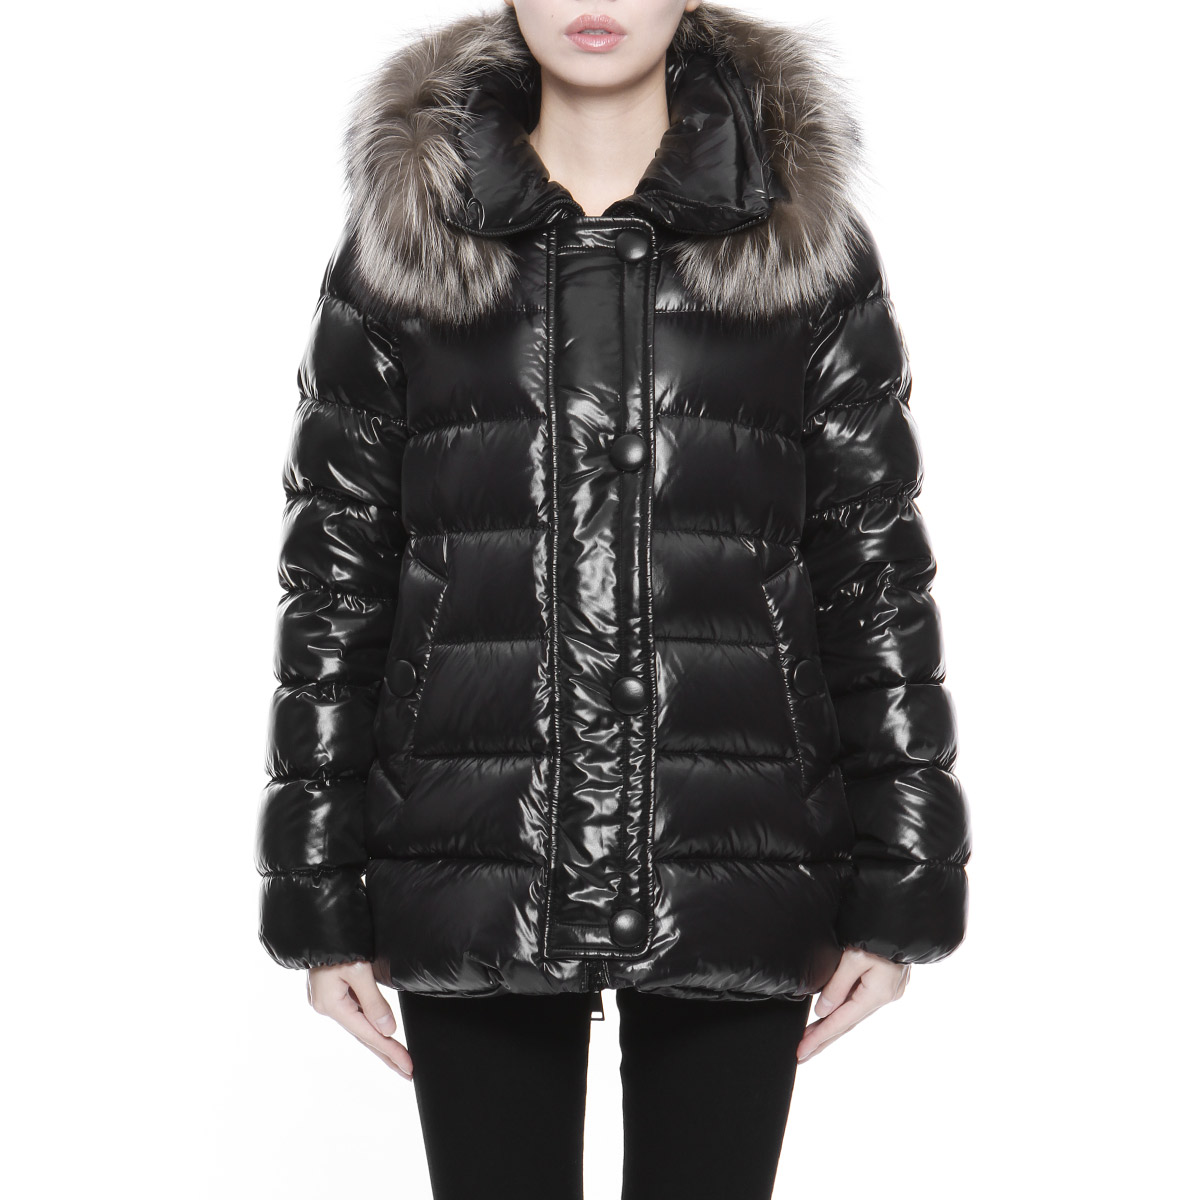 b8e830ef0 Monk rail MONCLER outer Lady's TARIER 68950 999 fur down jacket TARIER テルアー  BLACK black belonging to